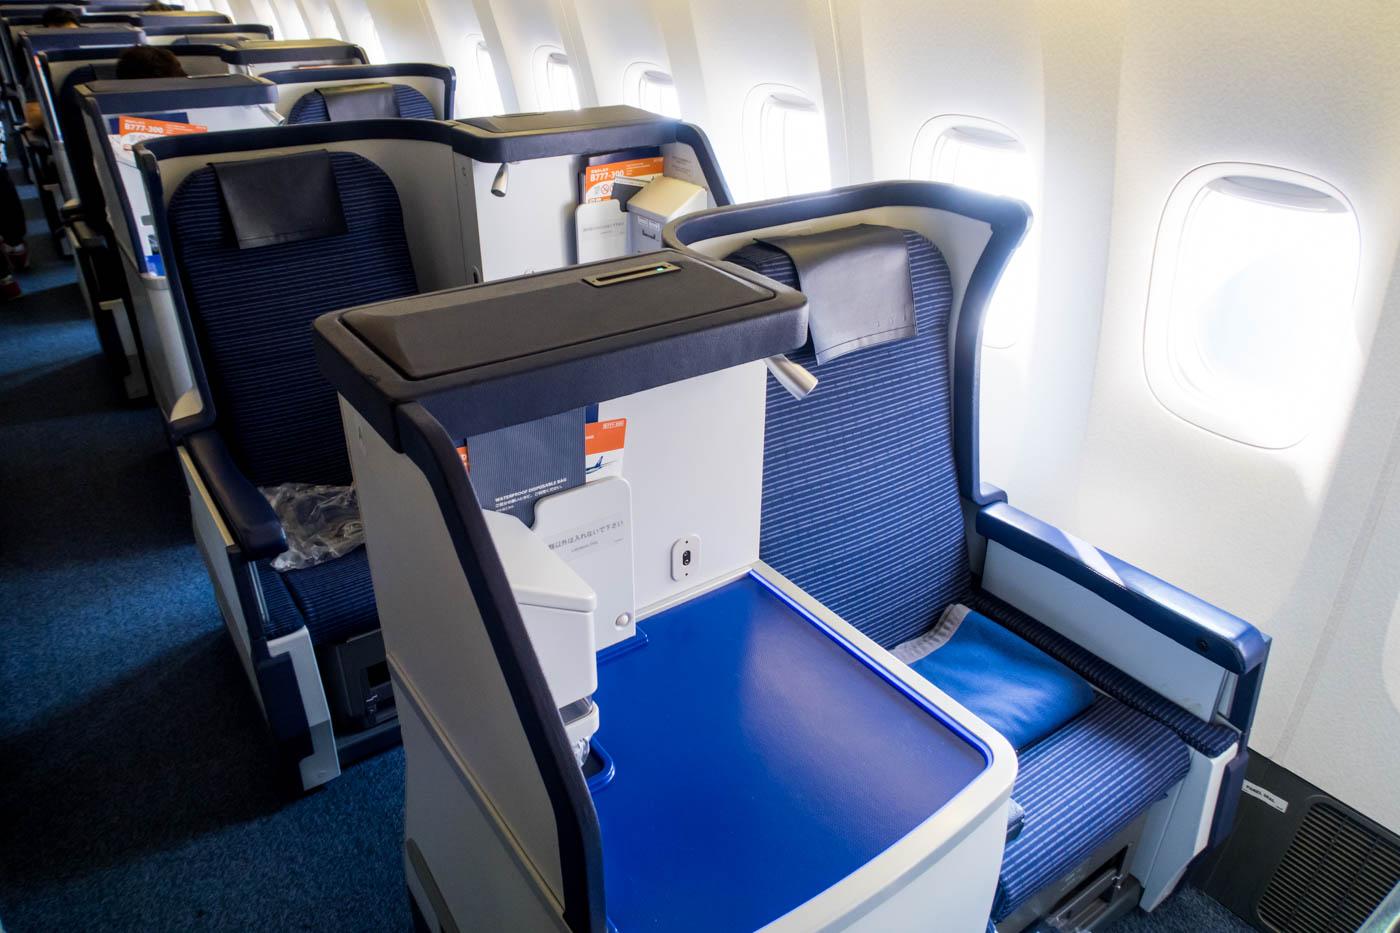 ANA 777-300ER Business Class Cabin